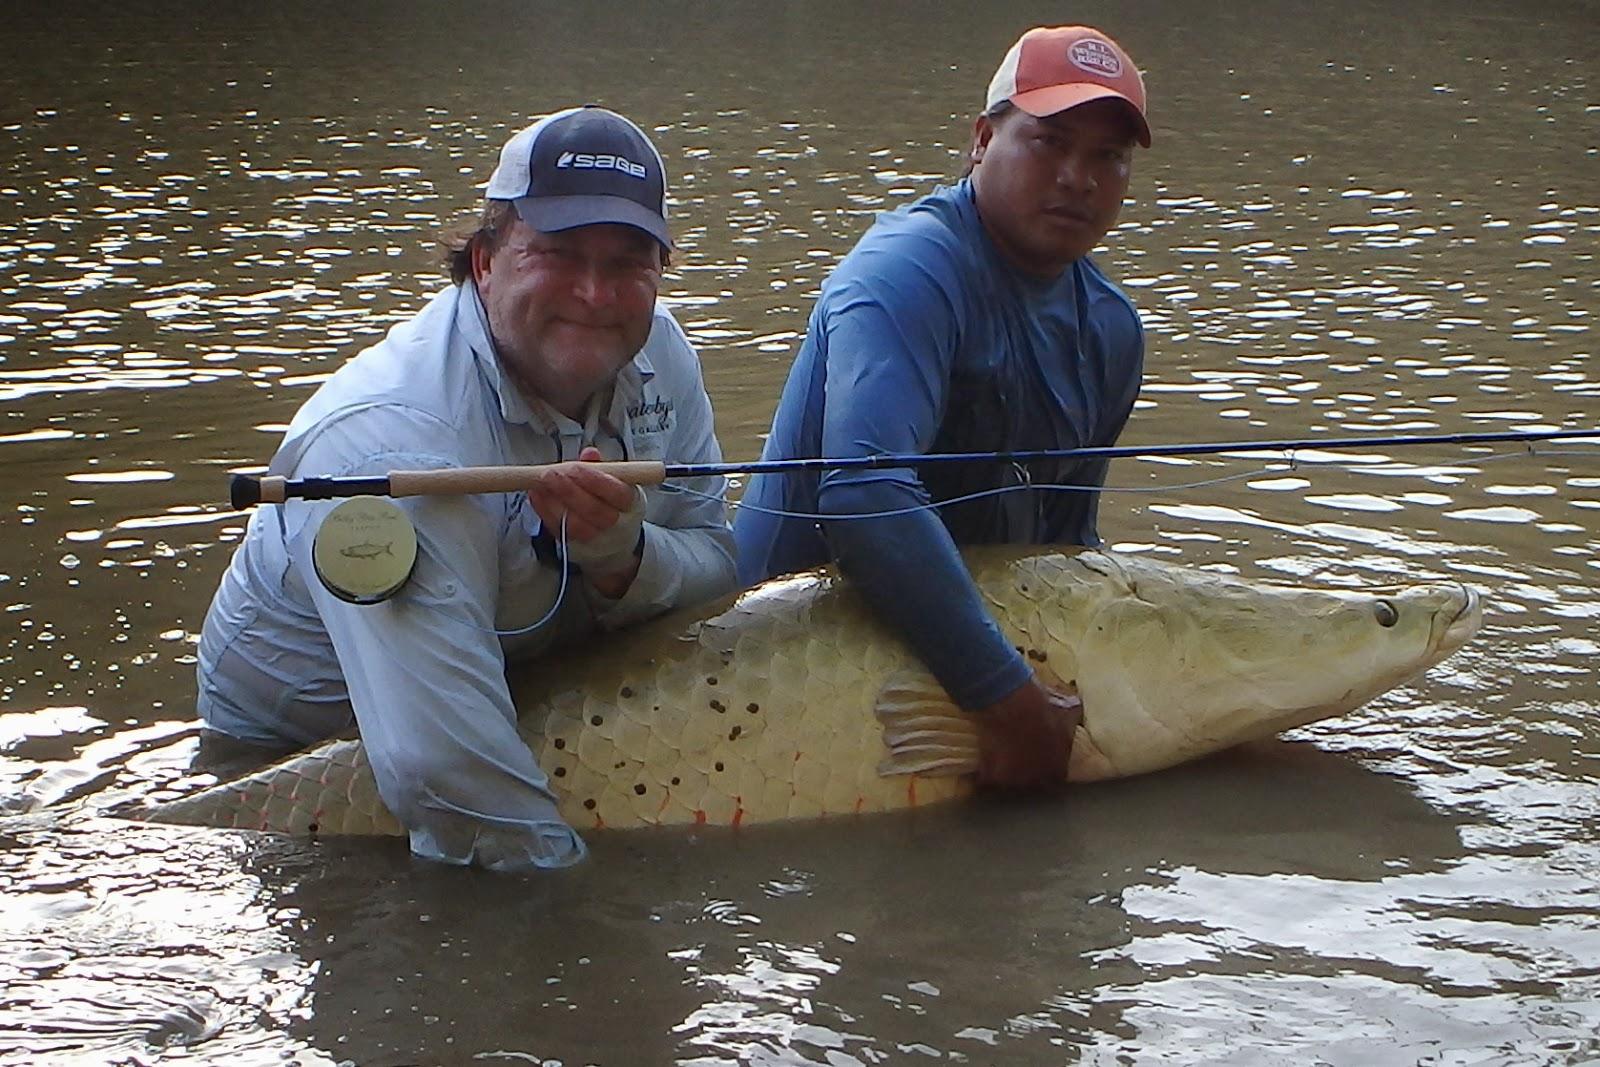 International fishing news guyana caught world record for Fly fishing news